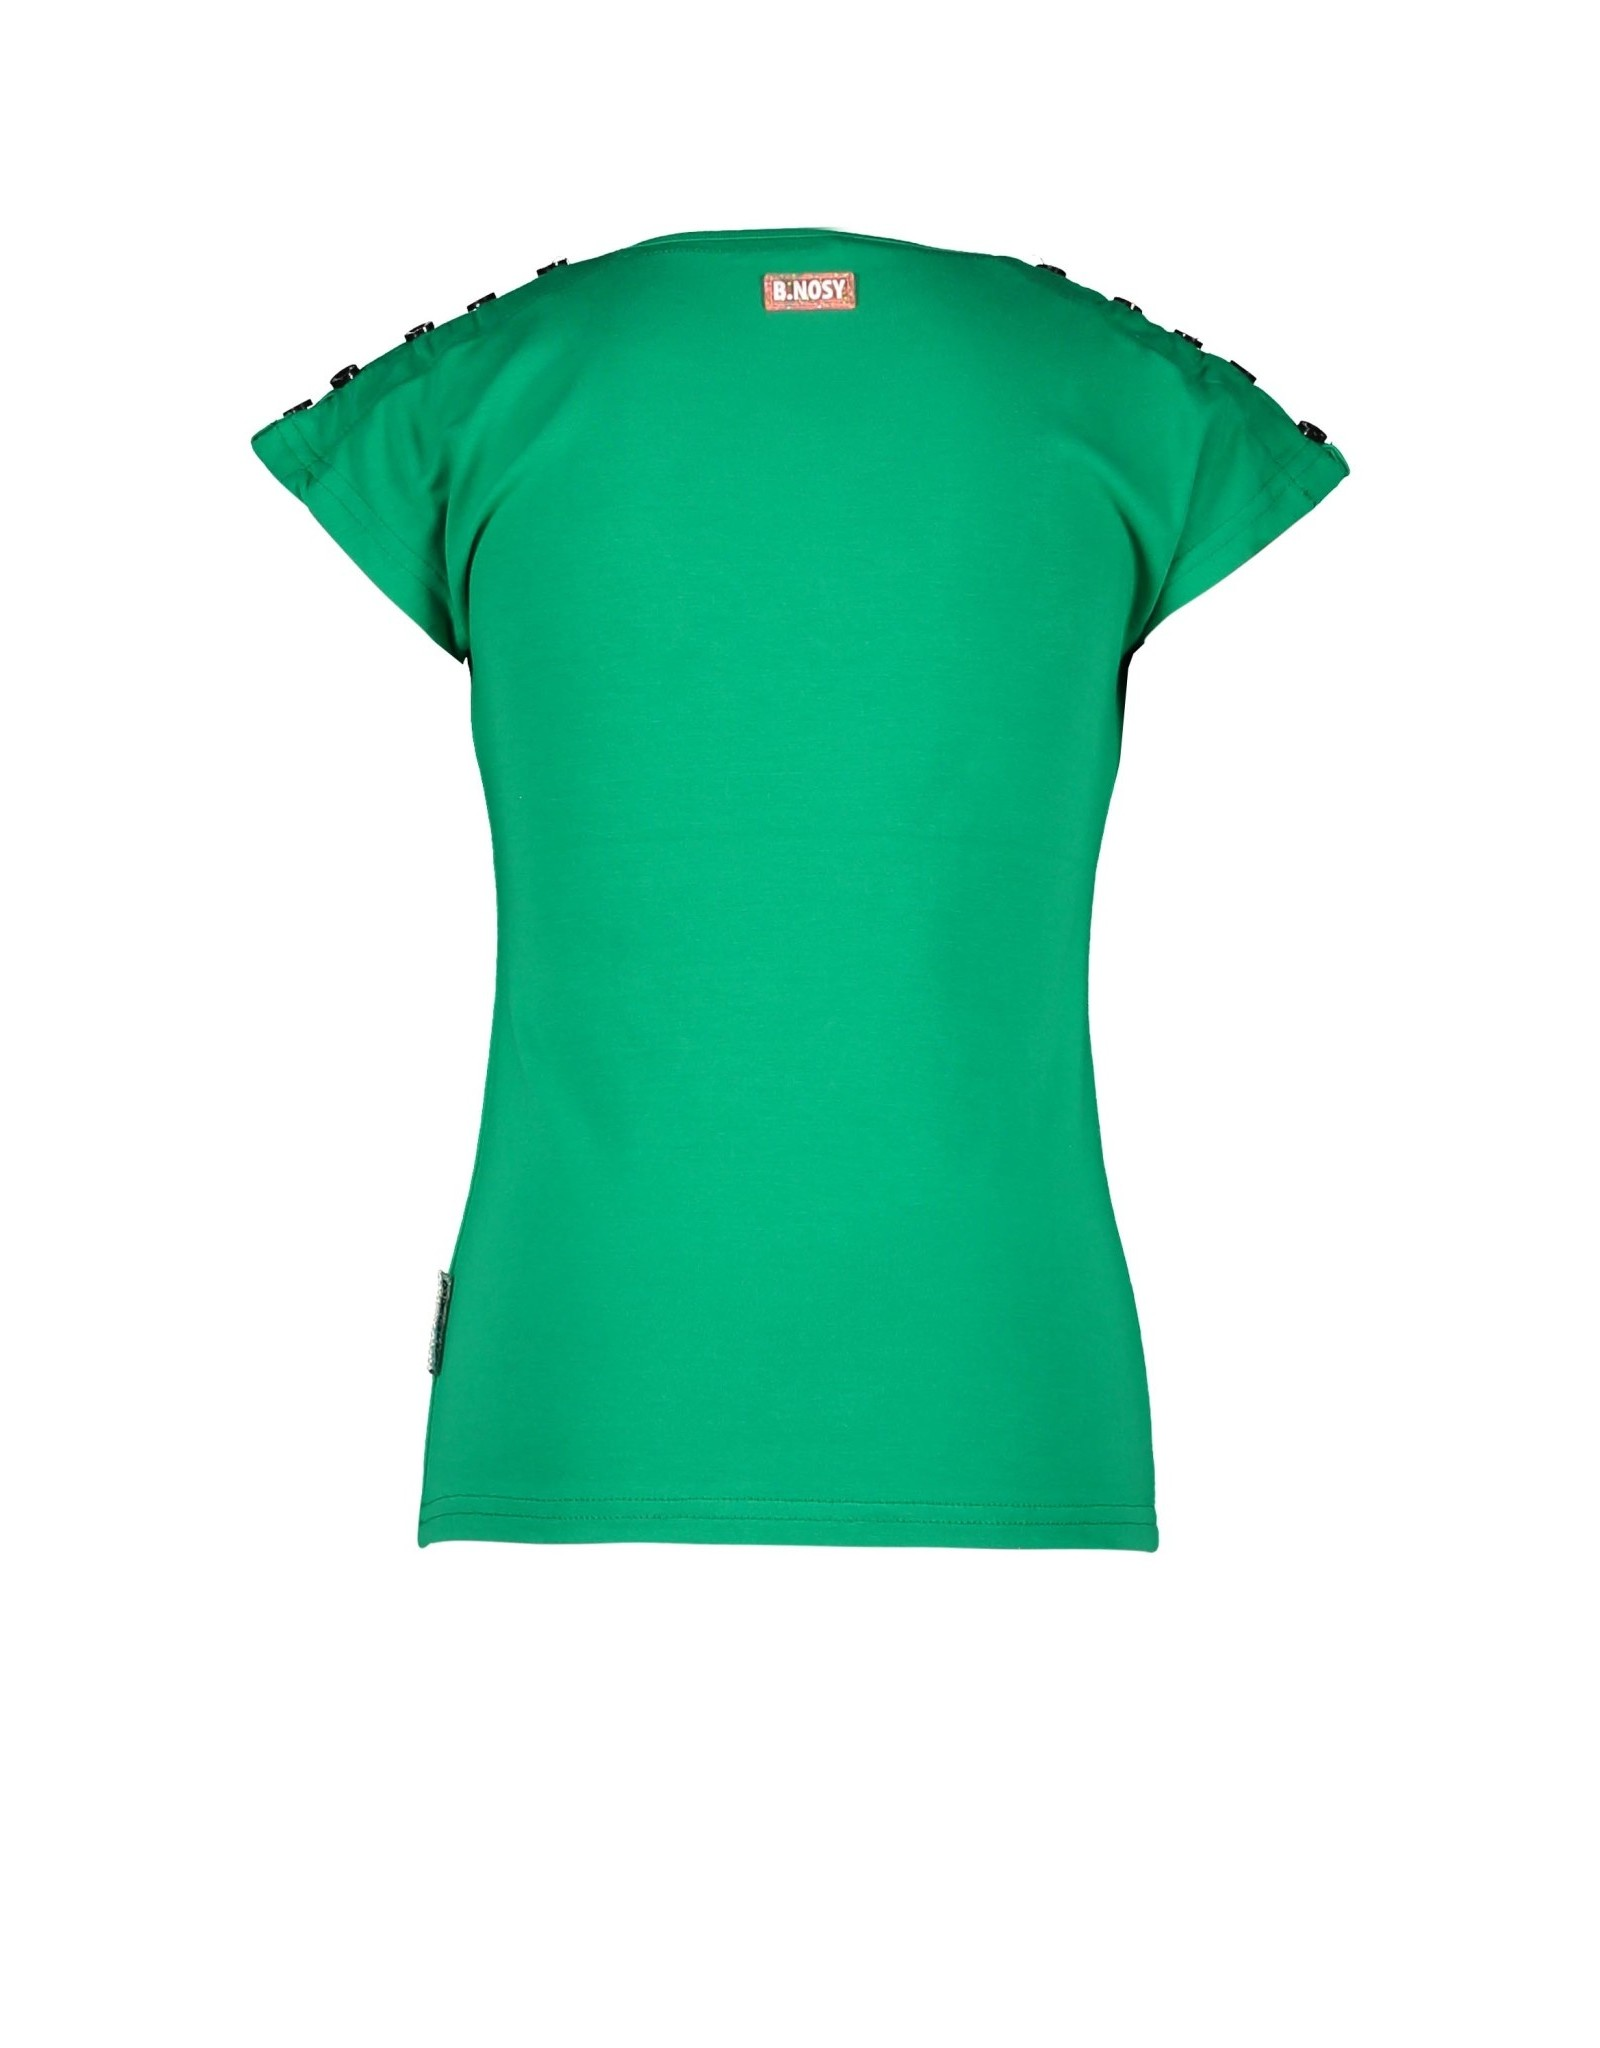 B.Nosy B.Nosy meisjes t-shirt Lovely Golf Green